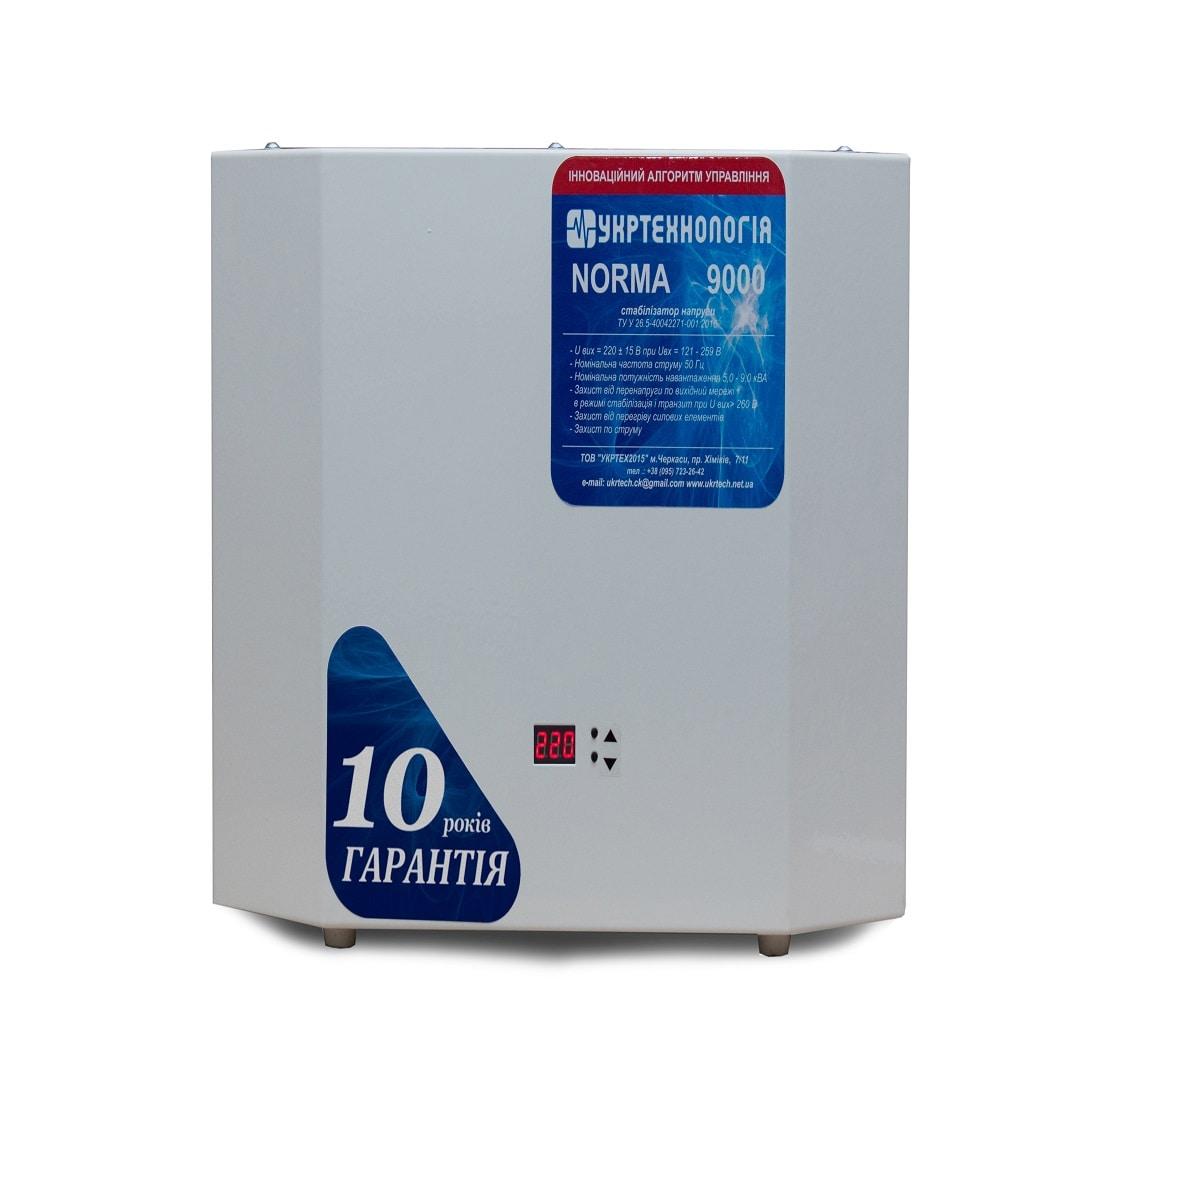 Для дома - Стабилизатор напряжения 9 кВт NORMA 000001376 - Фото 1